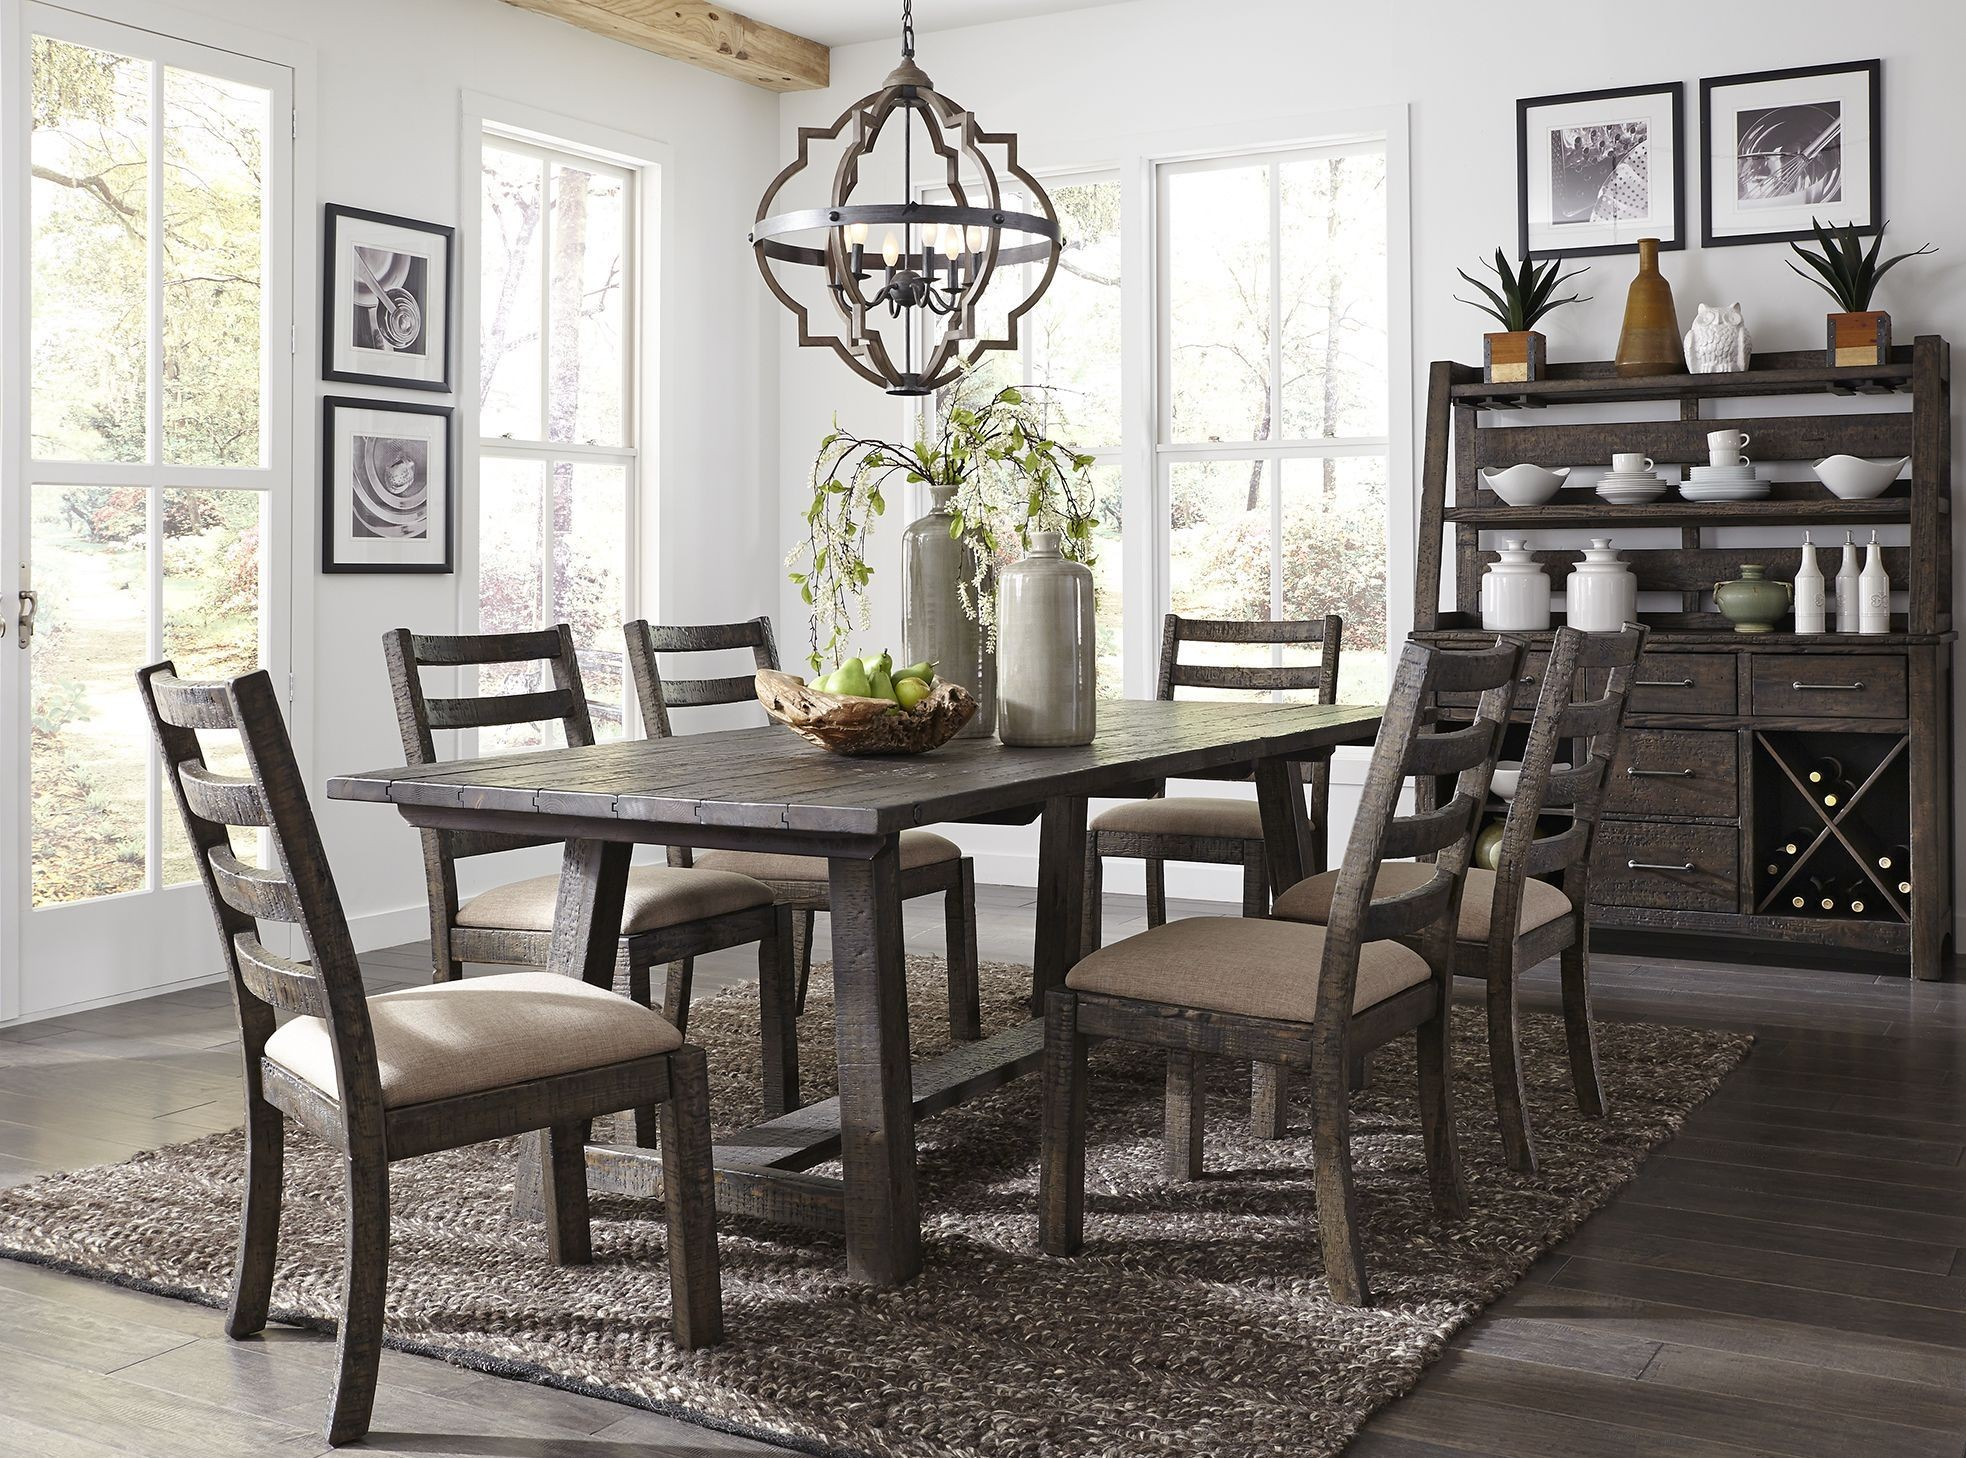 Prescott Dining Room Furniture